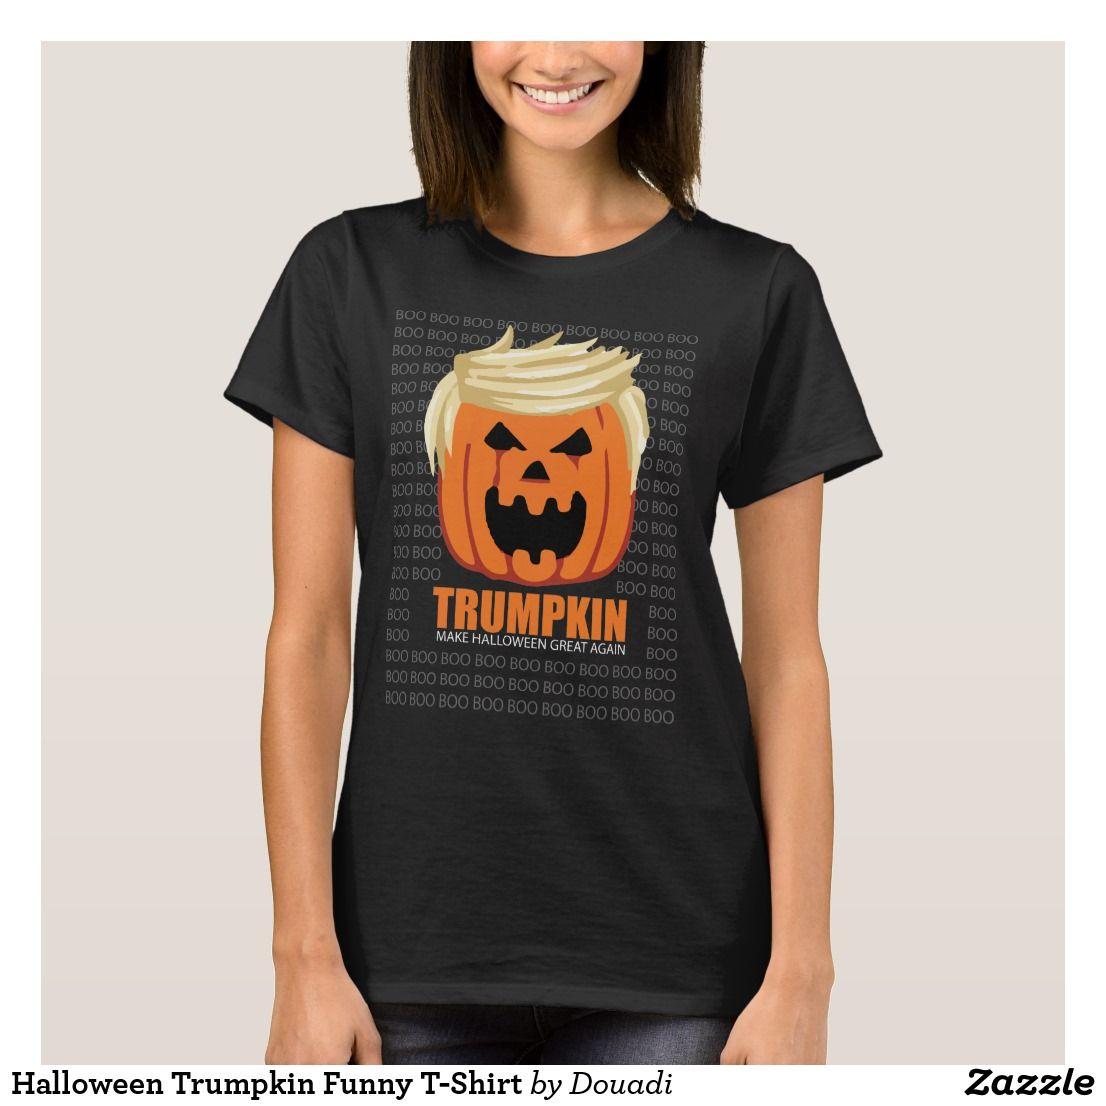 907429fee3a Halloween Trumpkin Funny T-Shirt in 2018